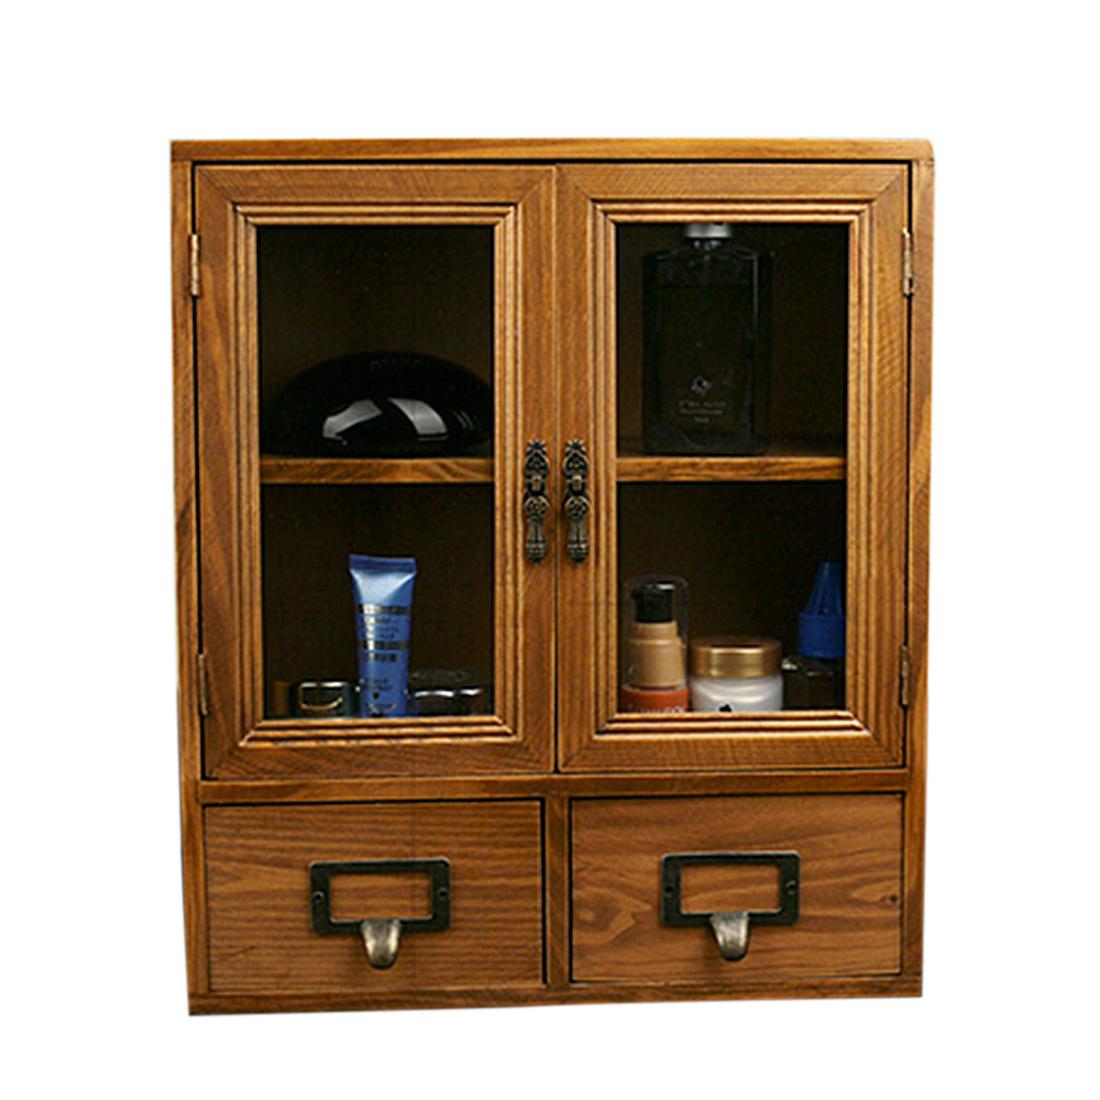 Retro Design Wooden Zakka Storage Chest Cabinet with Glass Door and Bottom 2 Drawers/Jewelry/Perfume Bottle Organizer - Yellow(China (Mainland))